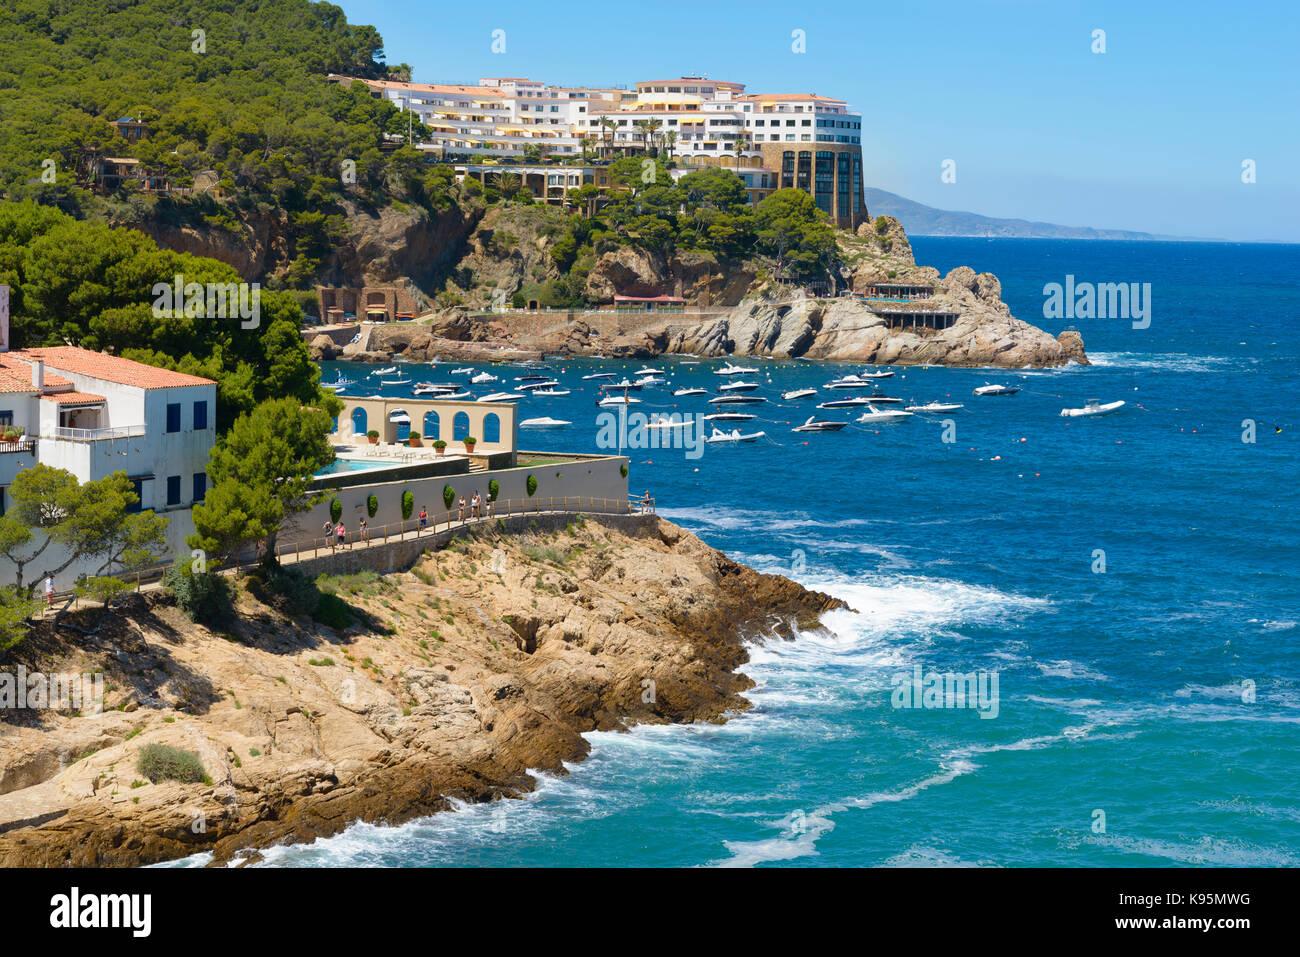 Aerial view of Sa Tuna beach resort Costa Brava Spain Stock Photo